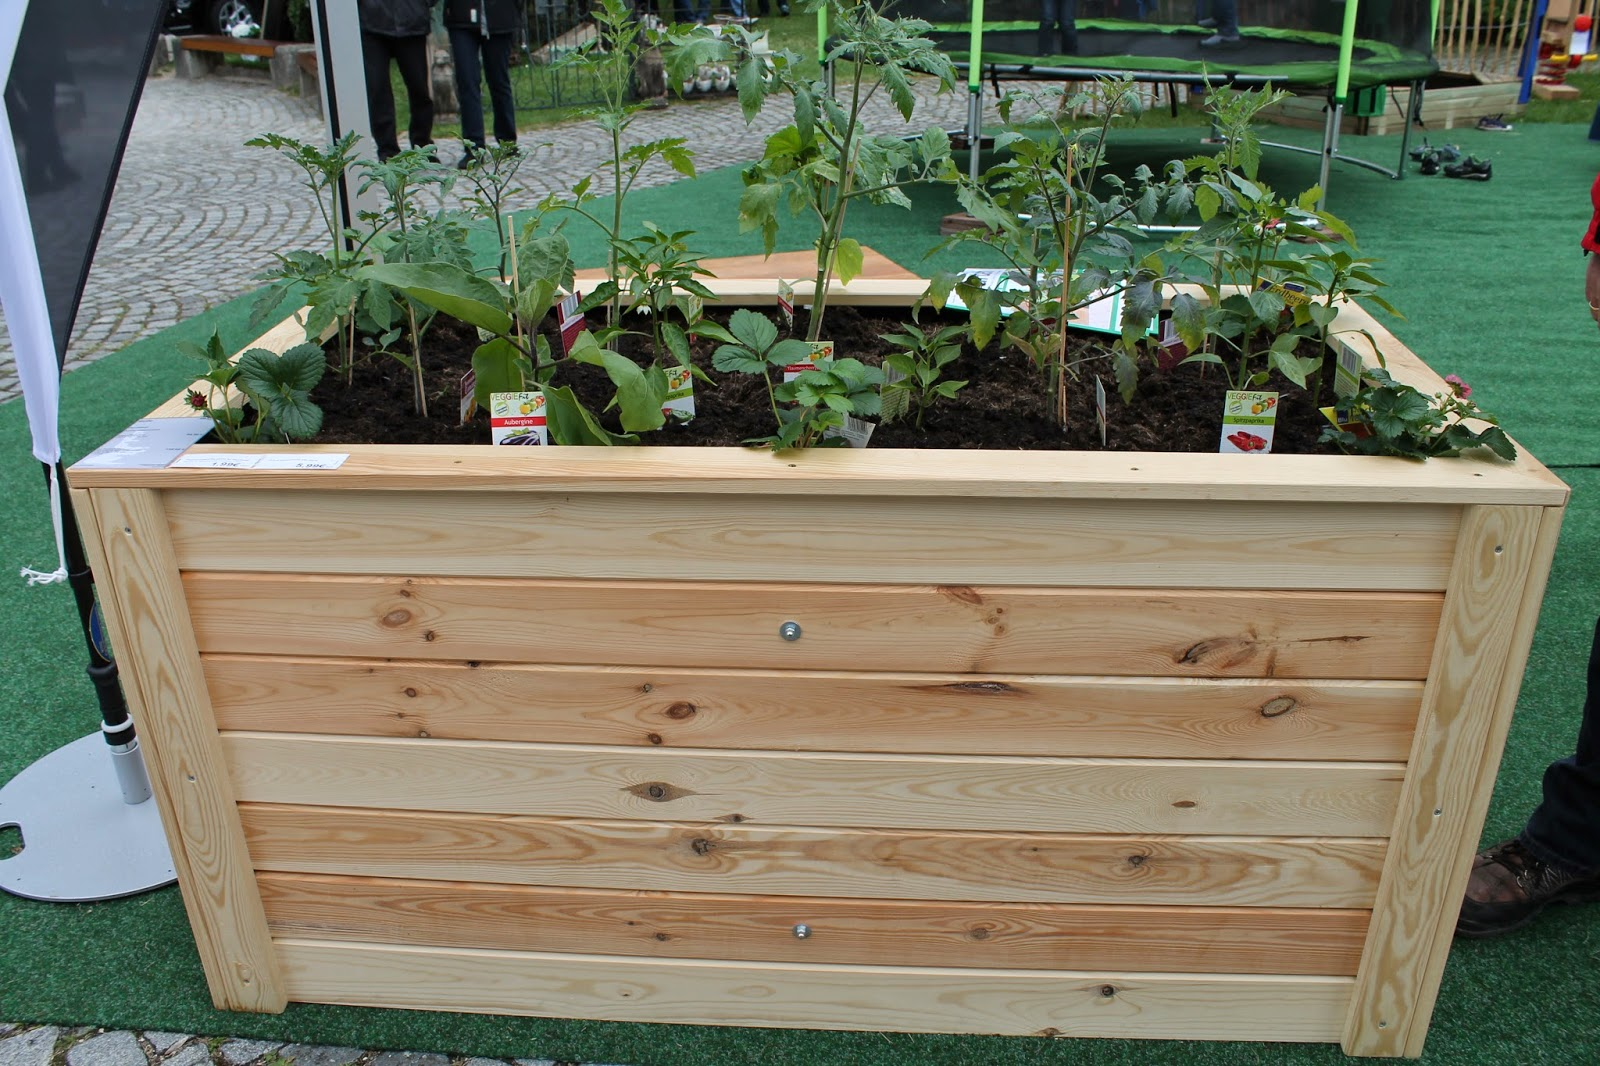 die kluge hausfrau veranstaltungstipp garden life in reutlingen. Black Bedroom Furniture Sets. Home Design Ideas